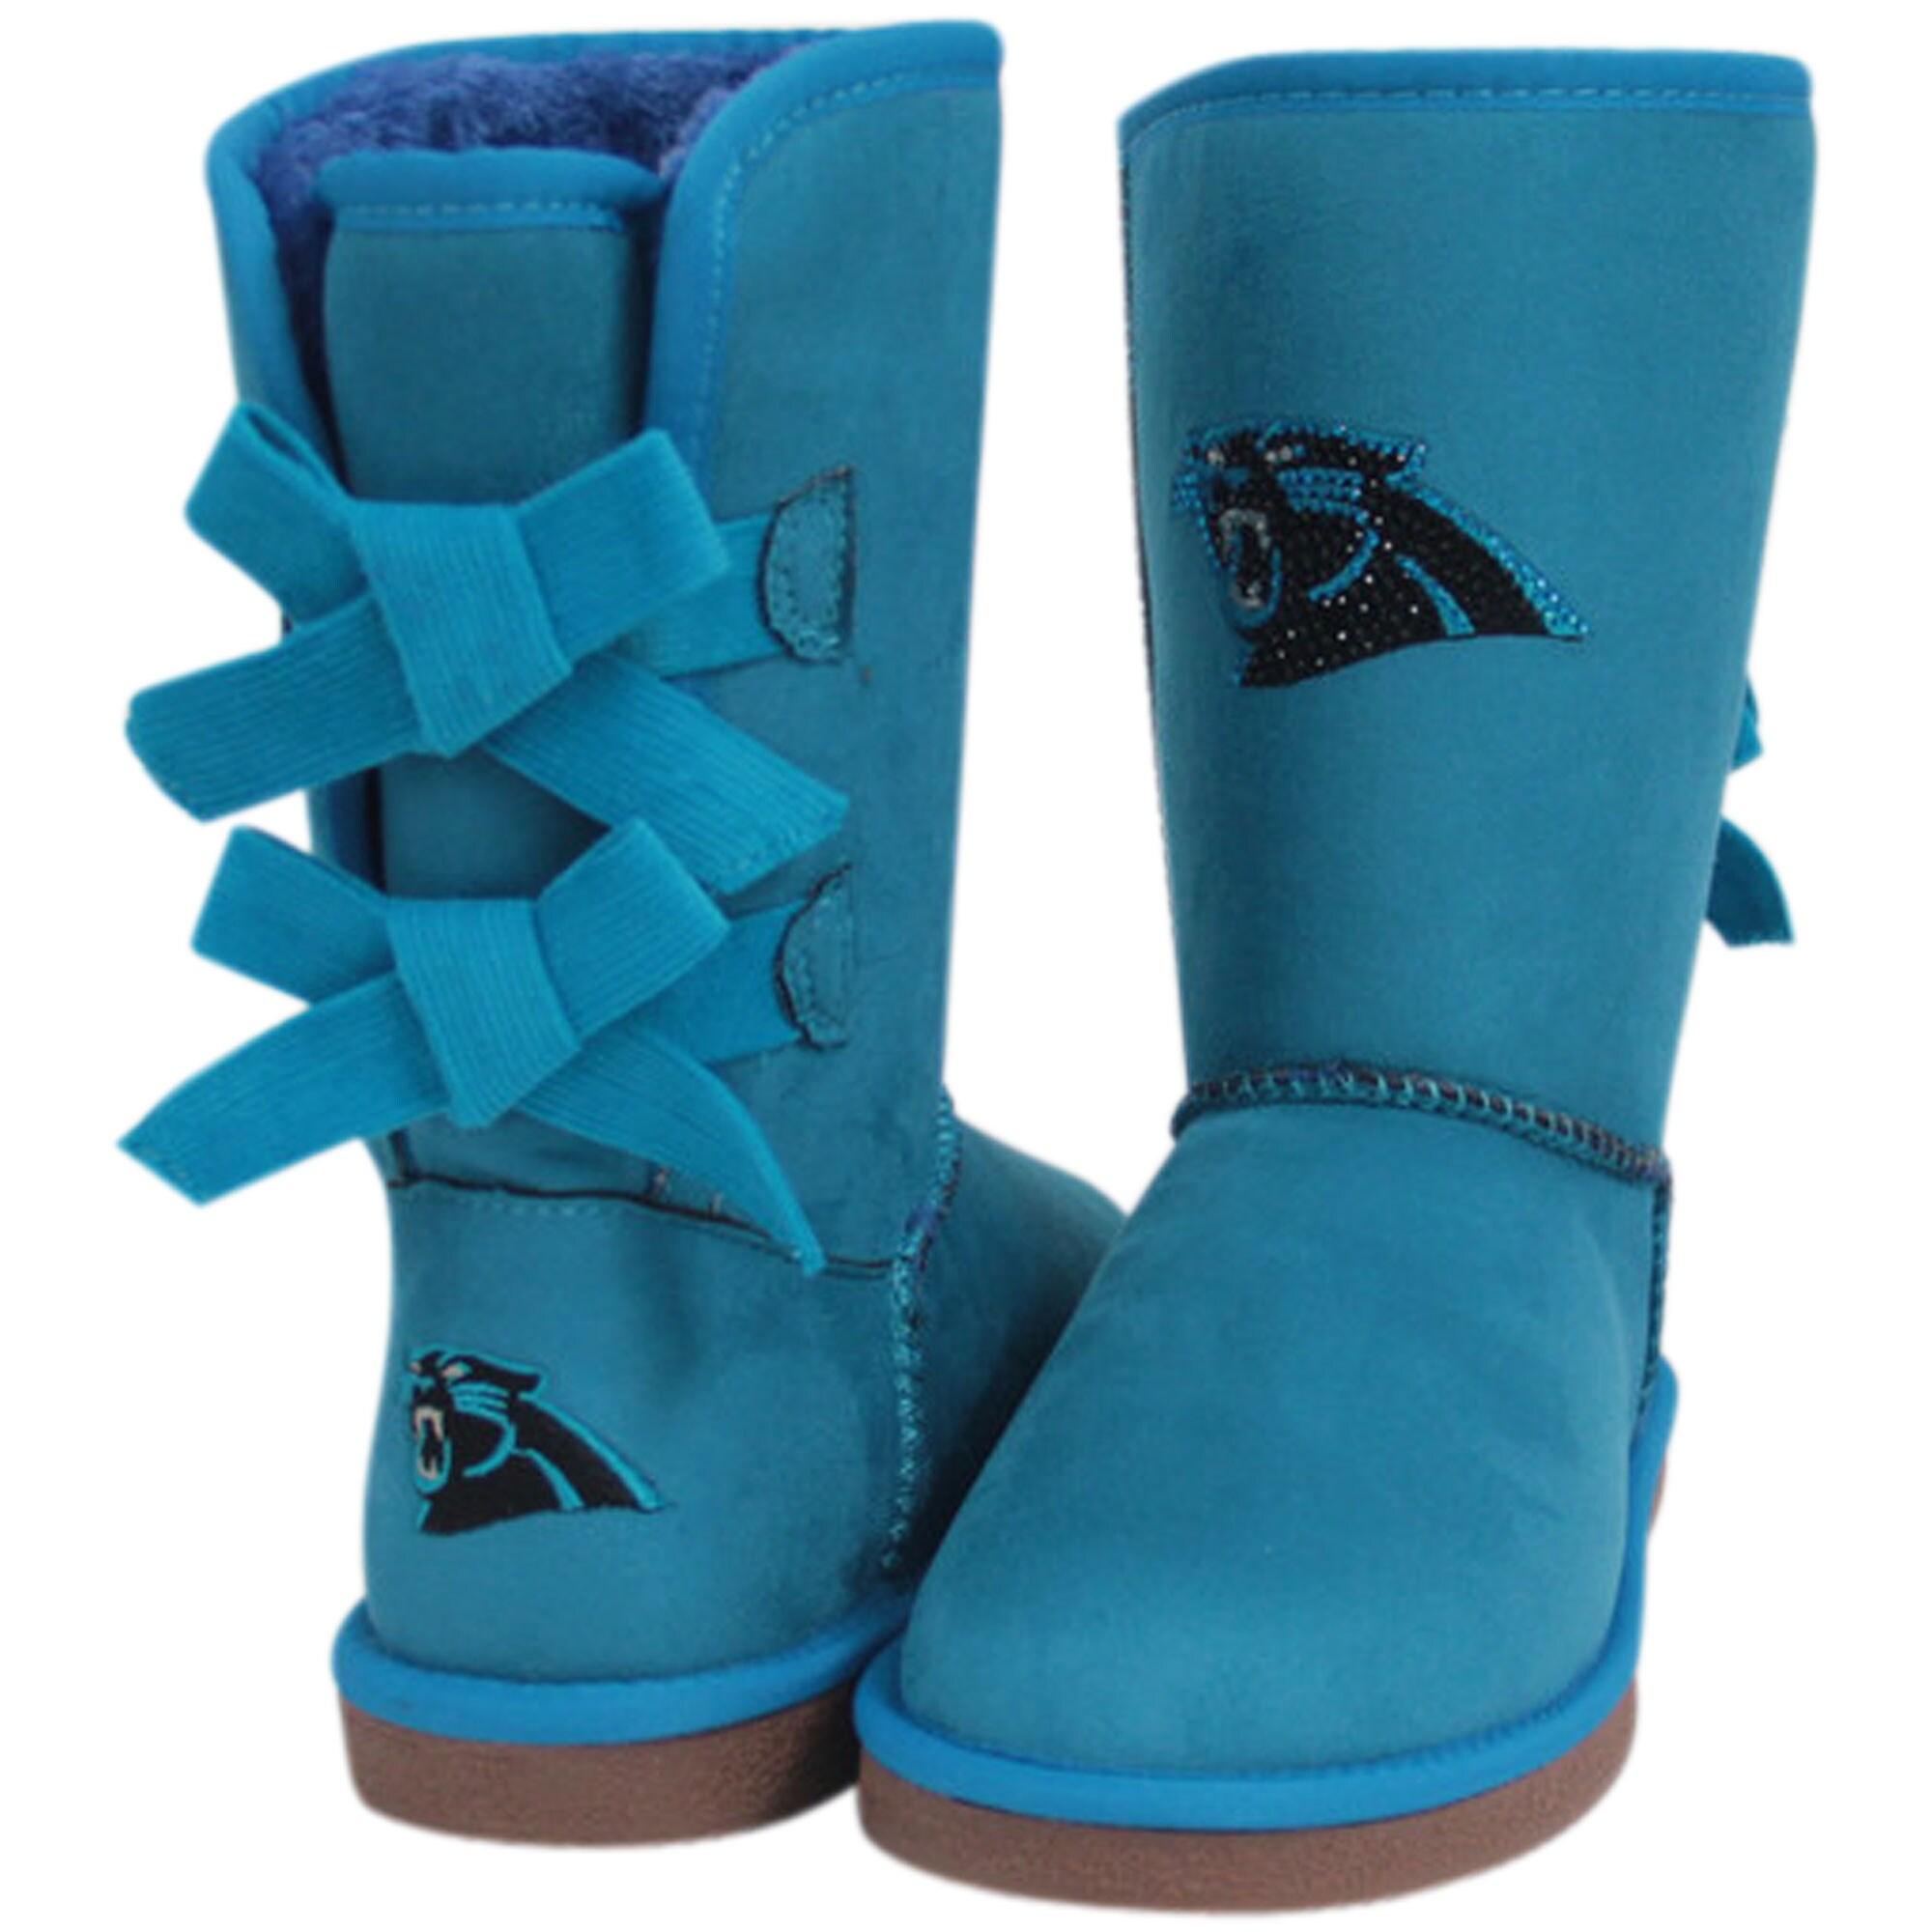 Carolina Panthers Cuce Women's Patron Bow Boots - Blue